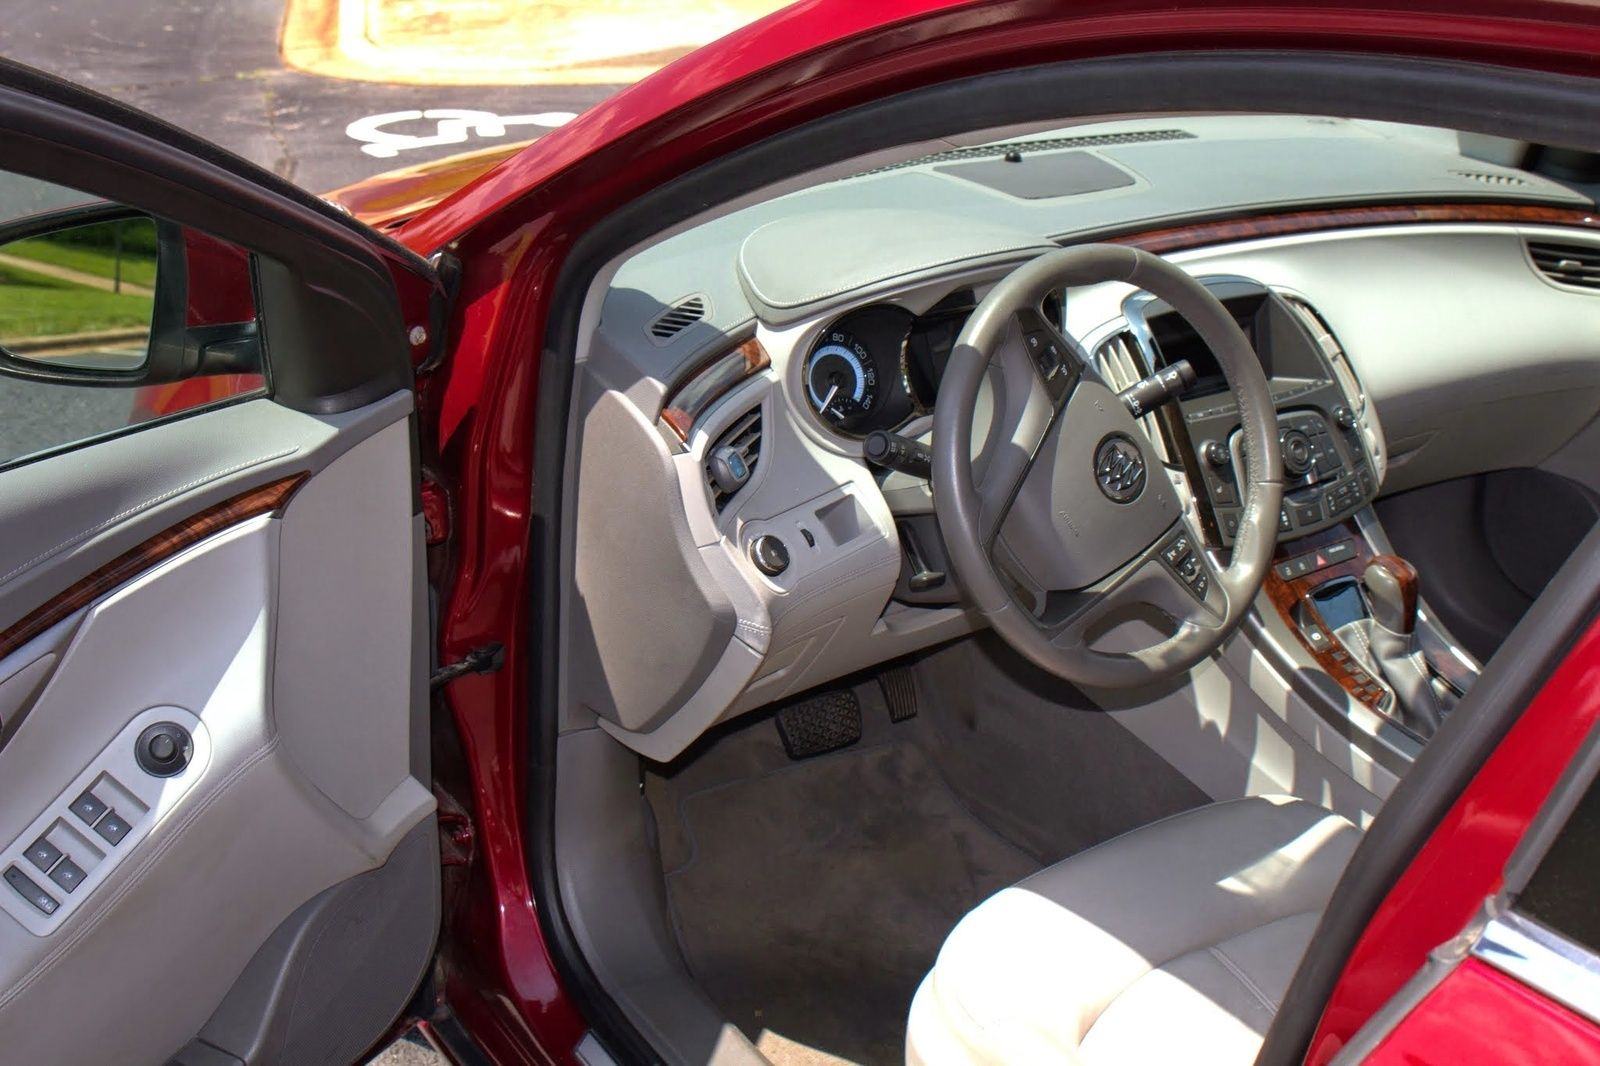 2010 Buick Lacrosse Cxl Fwd Buick Lacrosse Buick Lacrosse